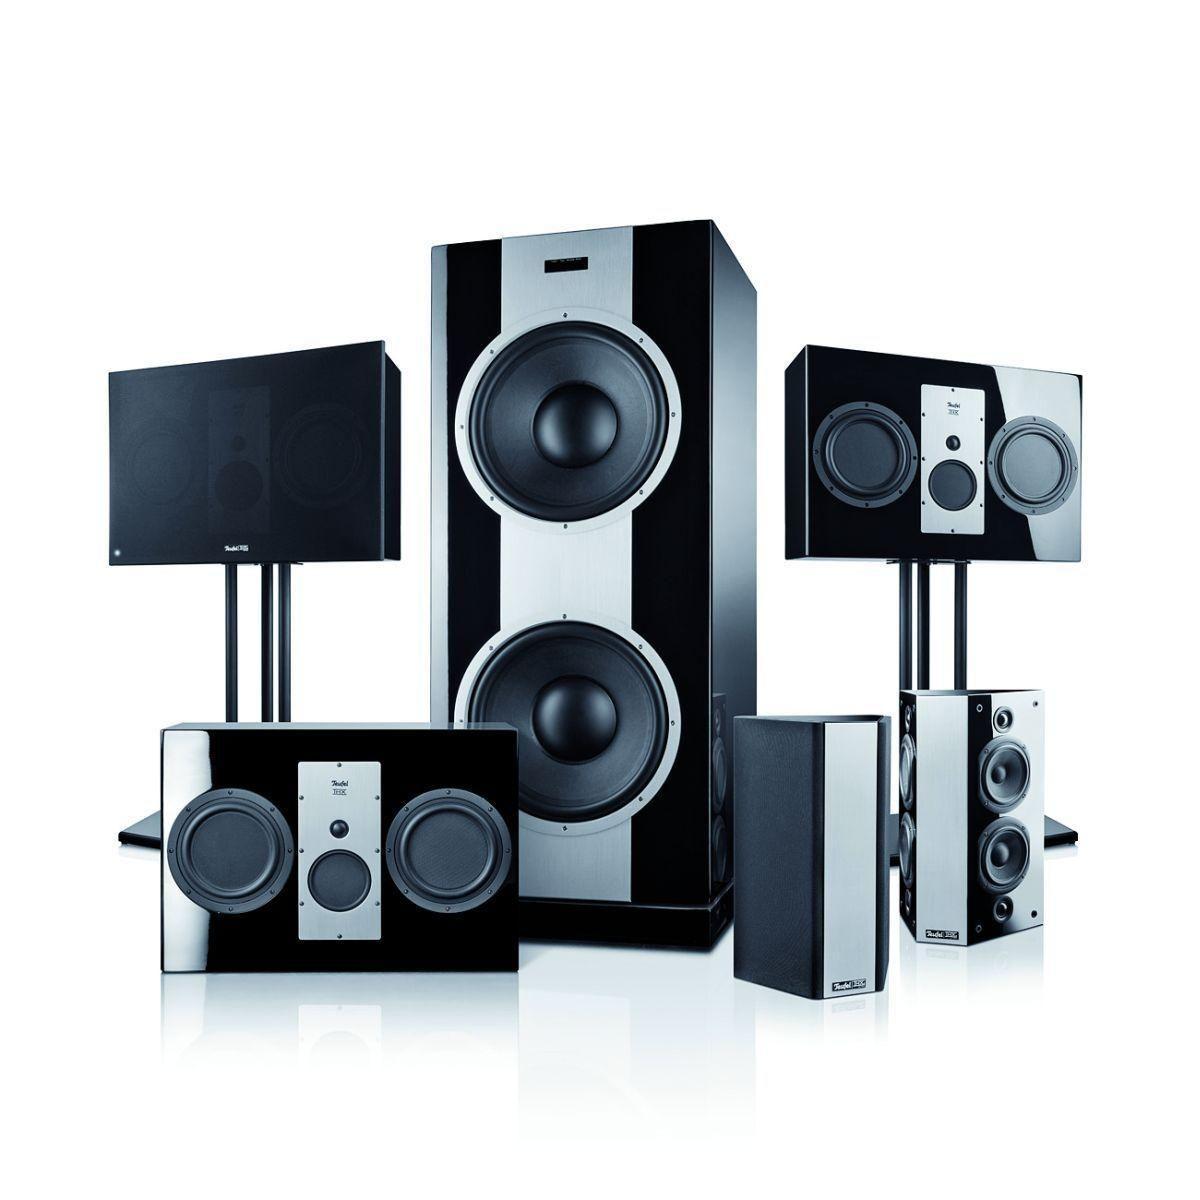 Teufel Speaker System 10 Thx Ultra 2 Certified Cinema 5 1 World S Smallest Thx Ultra 2 Certified System Best Home Theater System Sound System Mind Blown